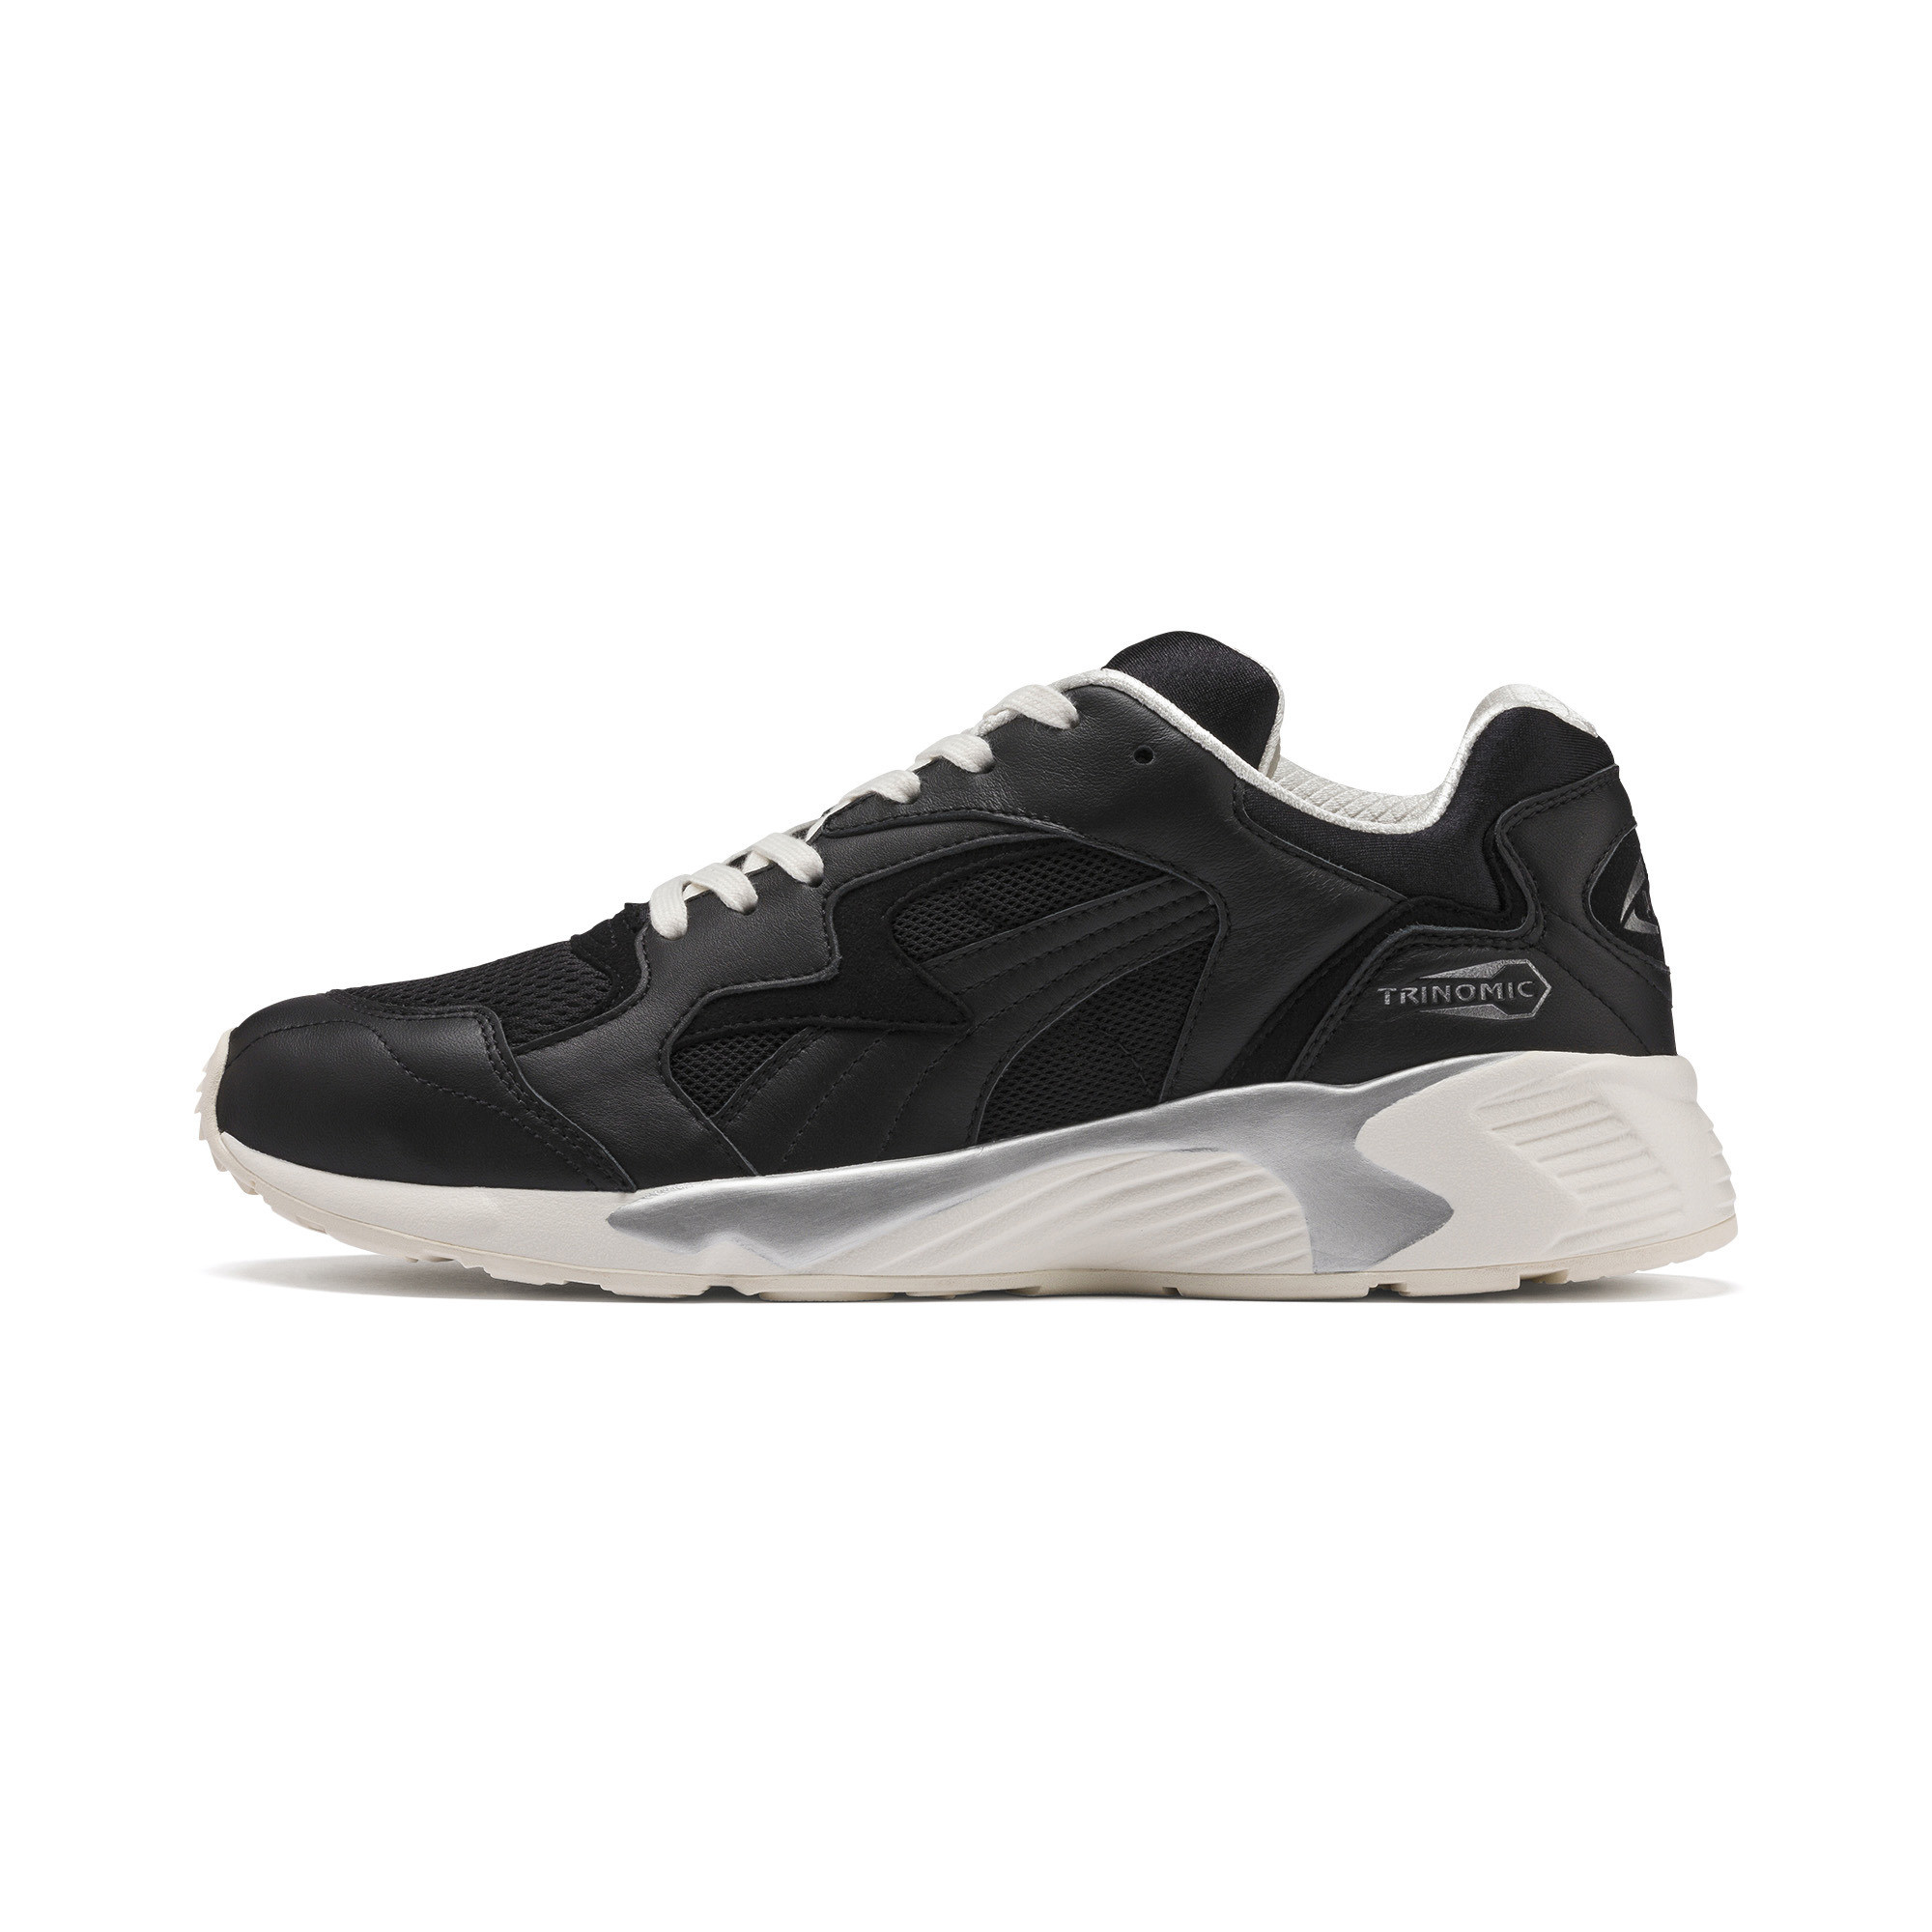 PUMA-Prevail-IR-Reality-Sneakers-Unisex-Shoe thumbnail 10